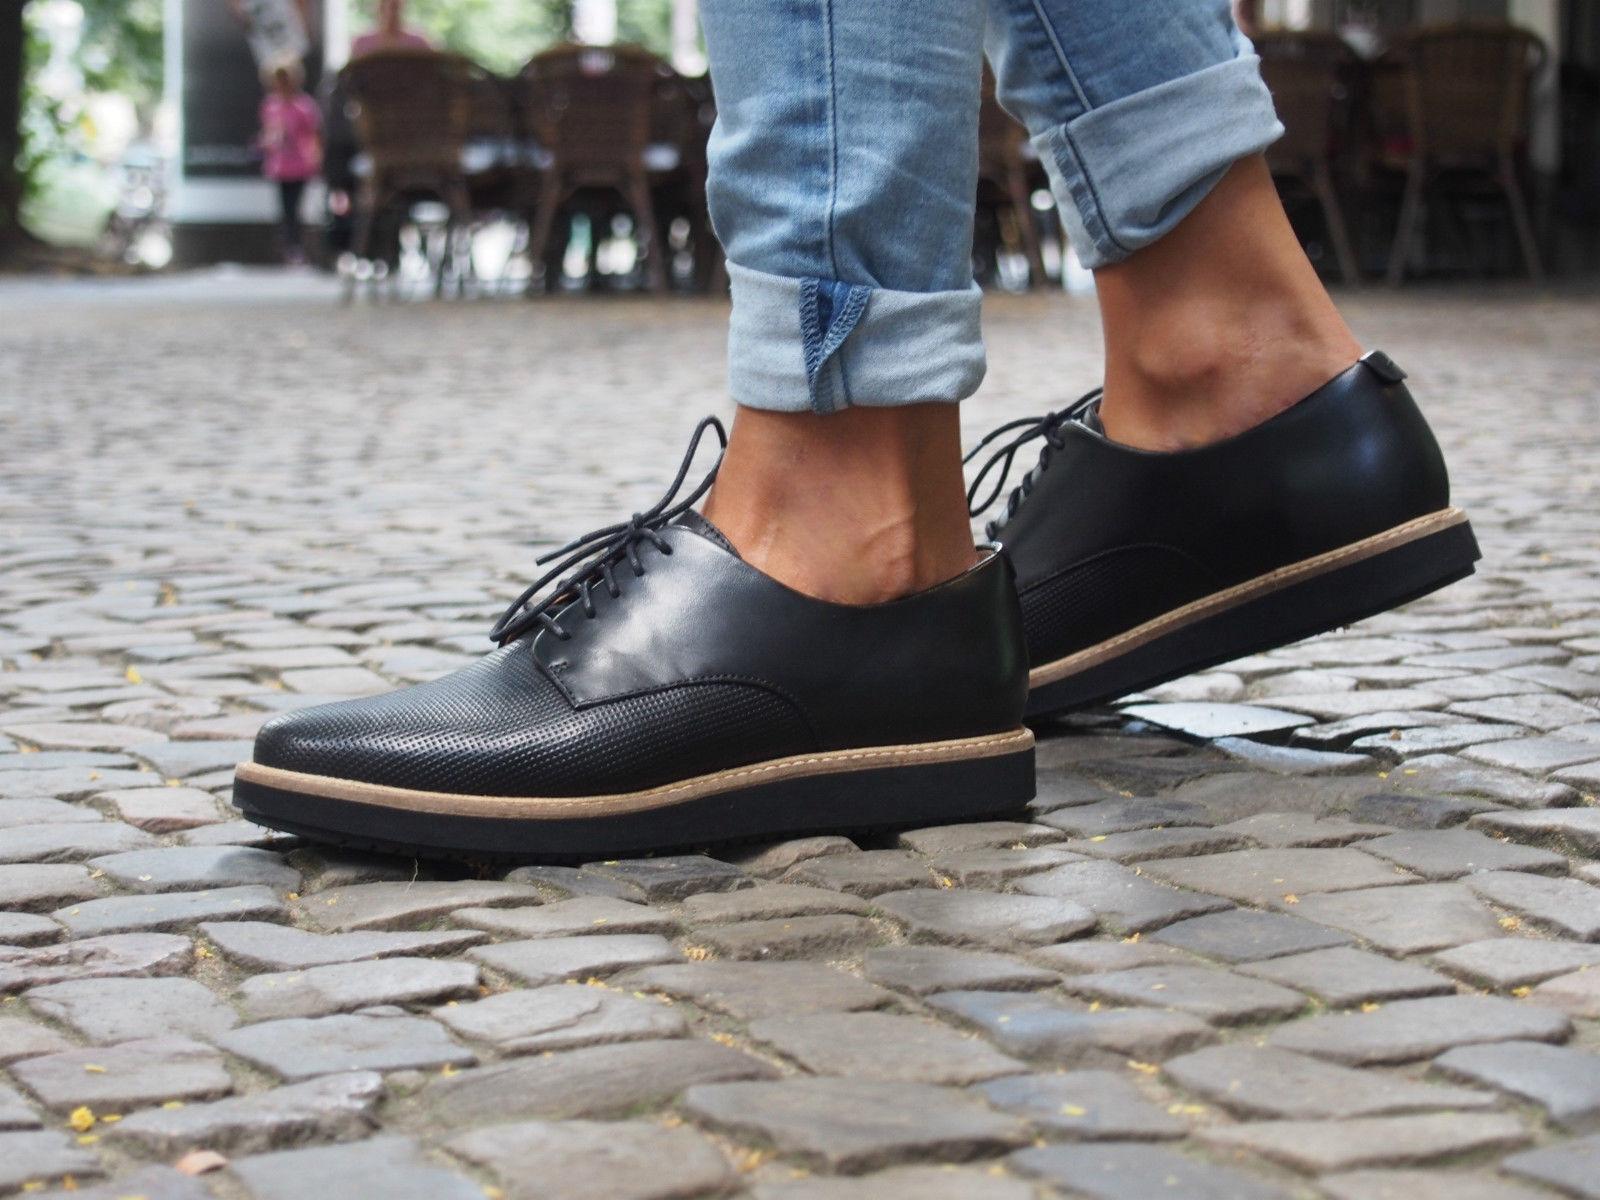 Clarks Schuhe GLICK DARBY schwarz 26111967 schwarz Echtleder Damen Halbschuhe NEU